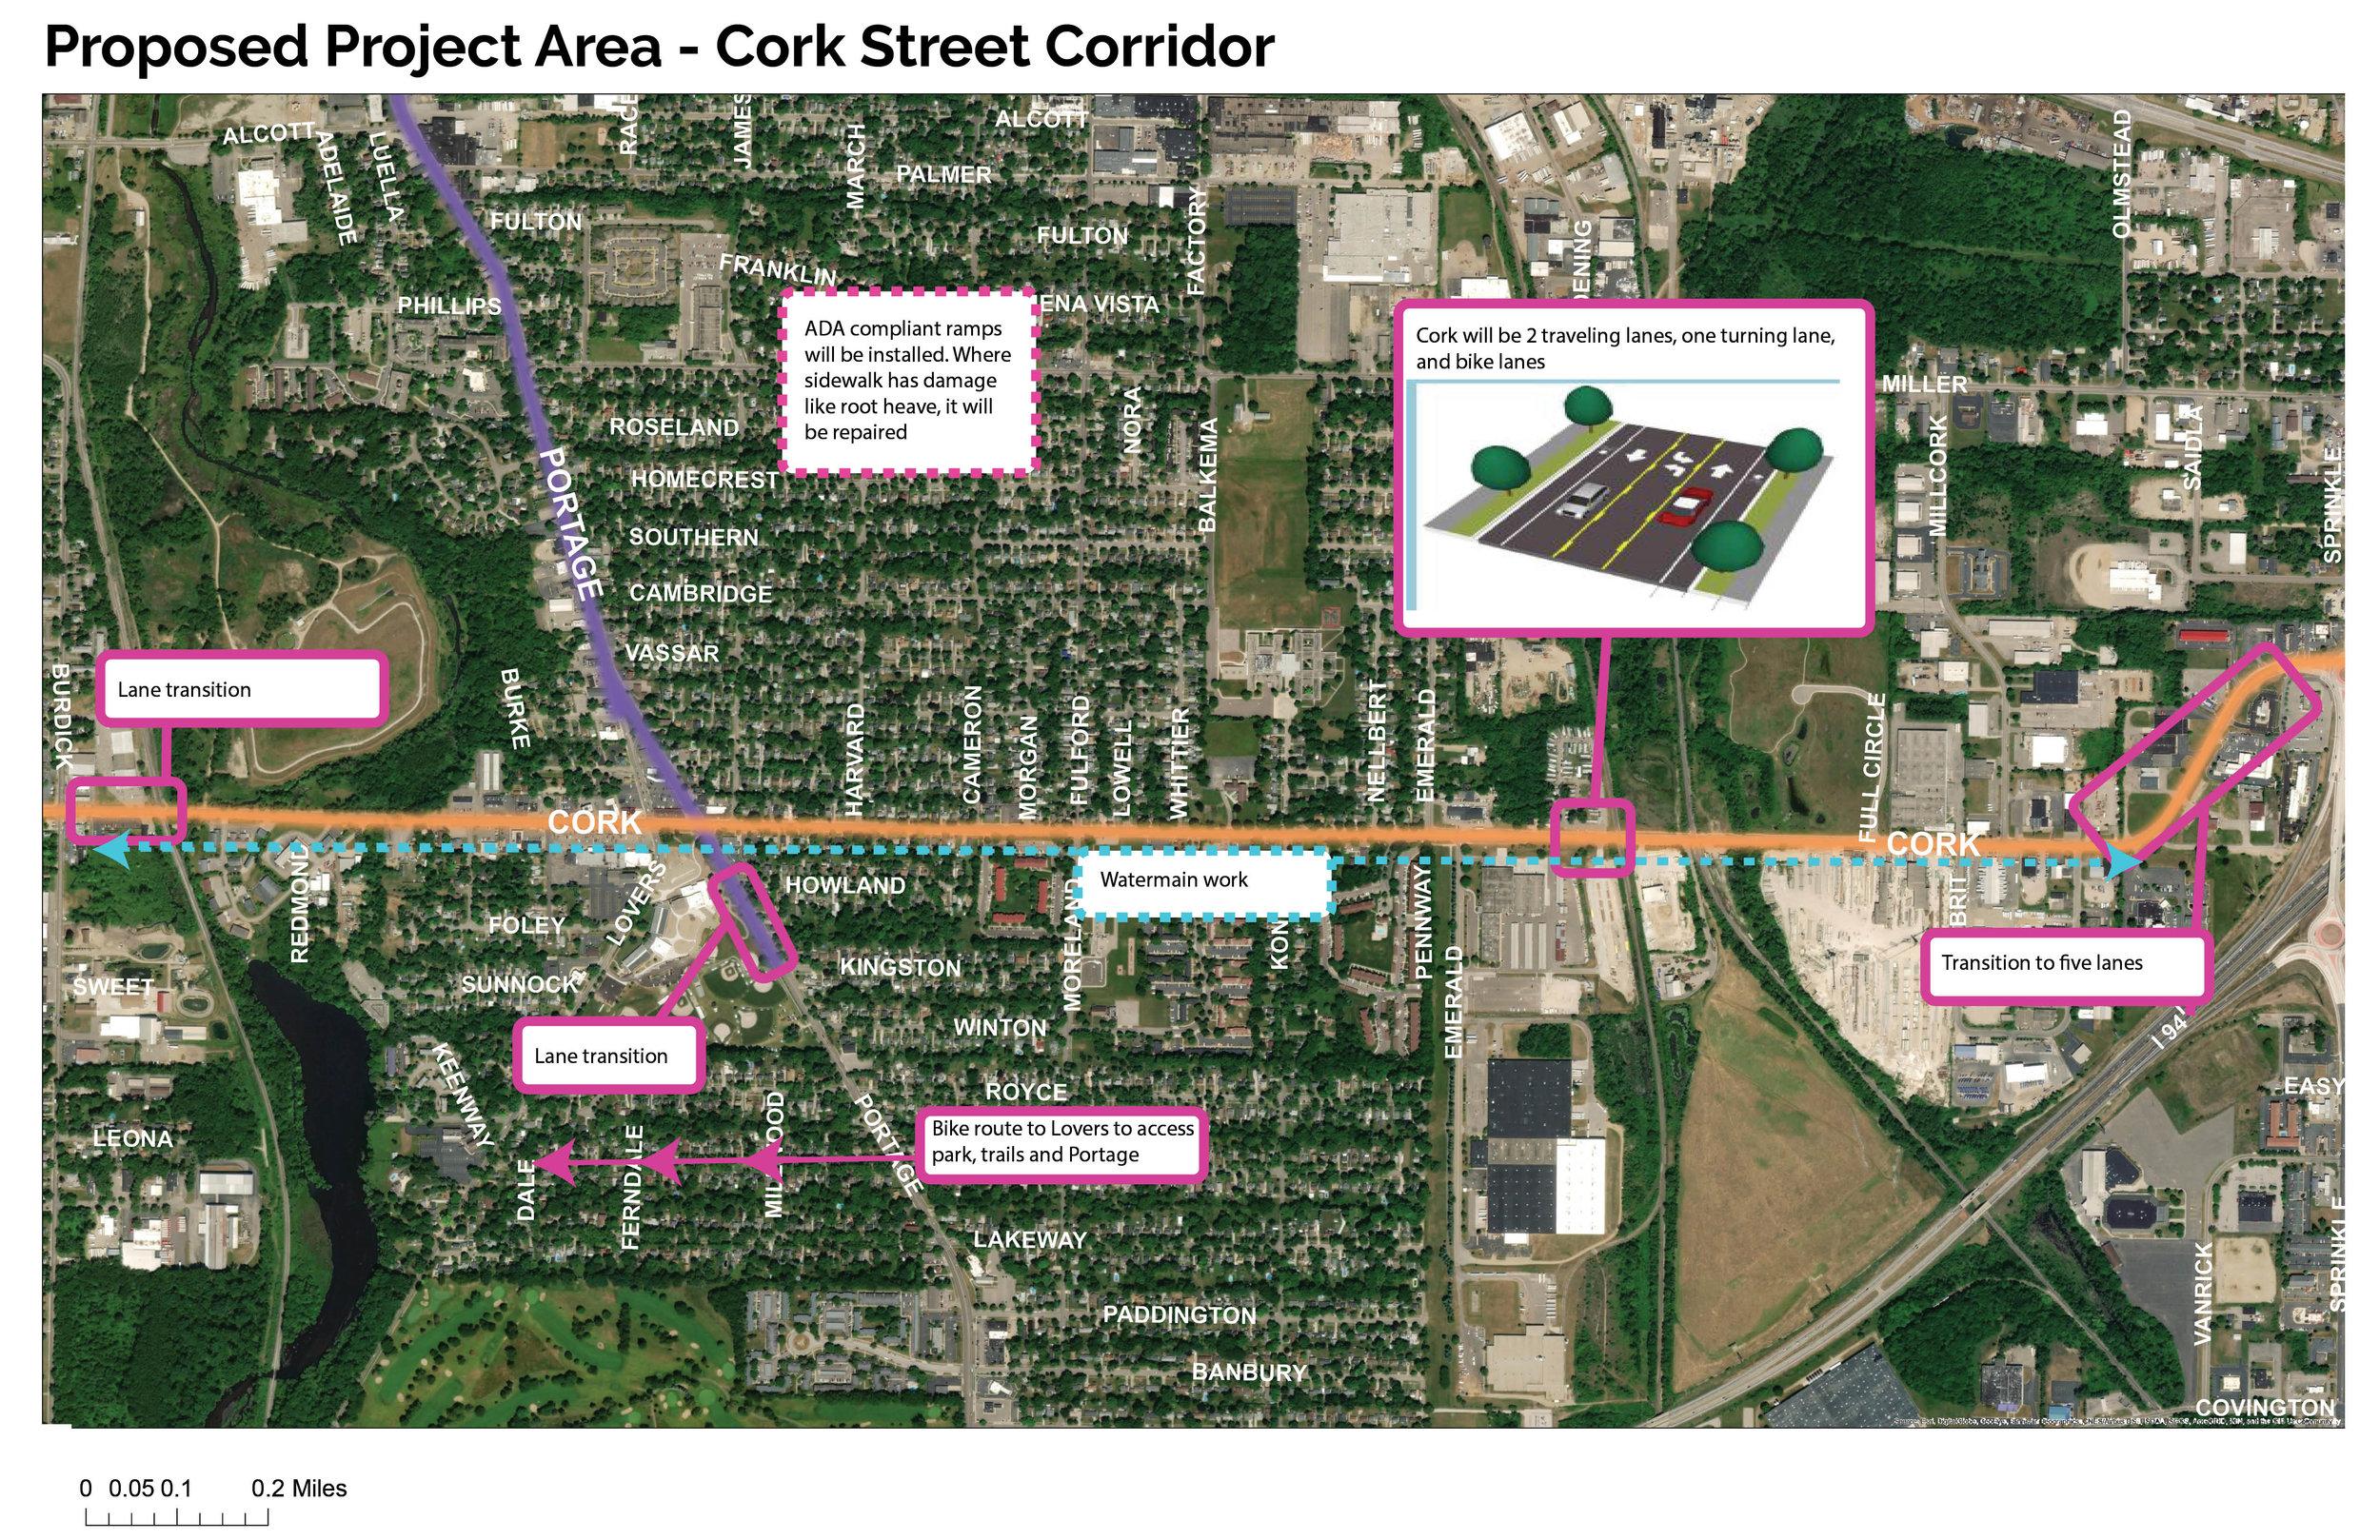 ProposedProjectArea_Cork.jpg